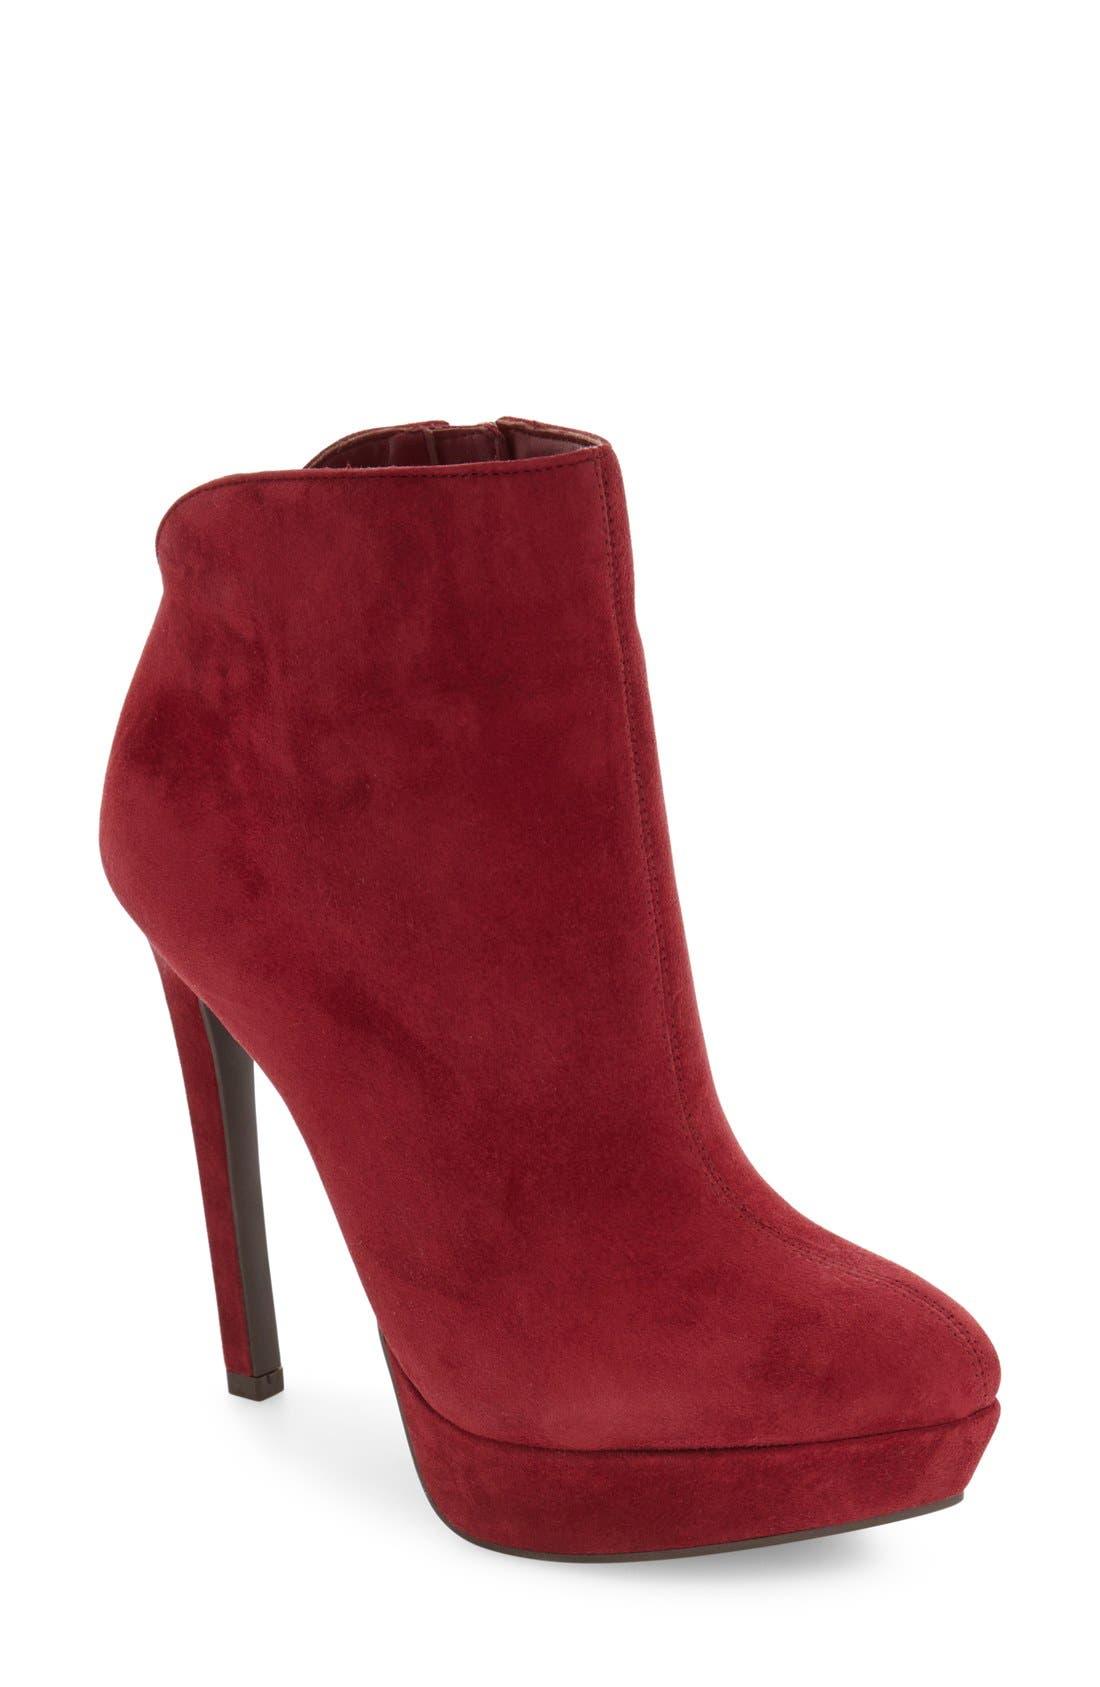 Main Image - Jessica Simpson 'Zamia' Platform Bootie (Women)